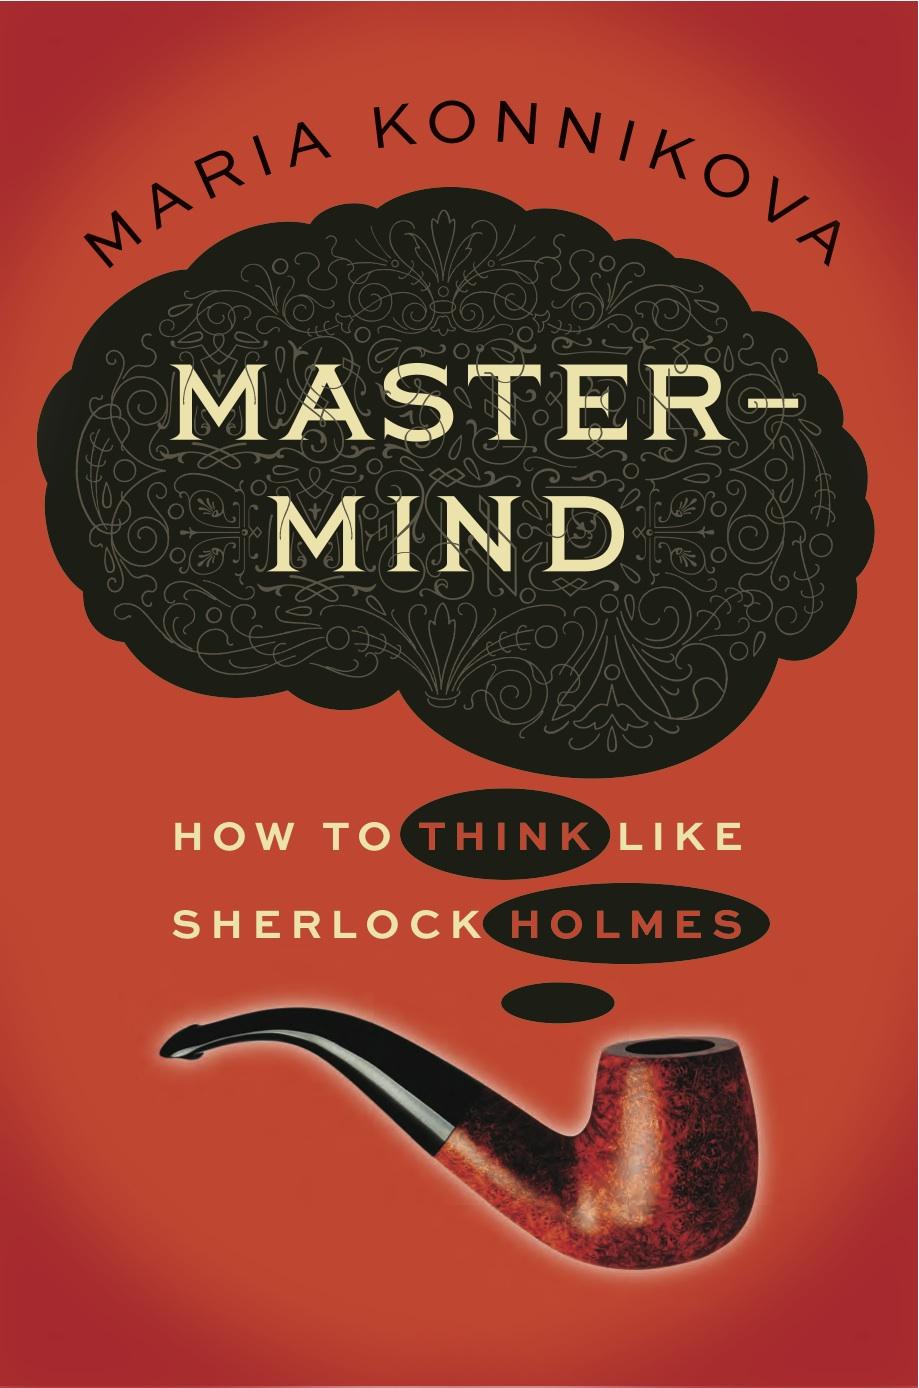 Mastermind How to Think Like Sherlock Holmes by Maria Konnikova book review